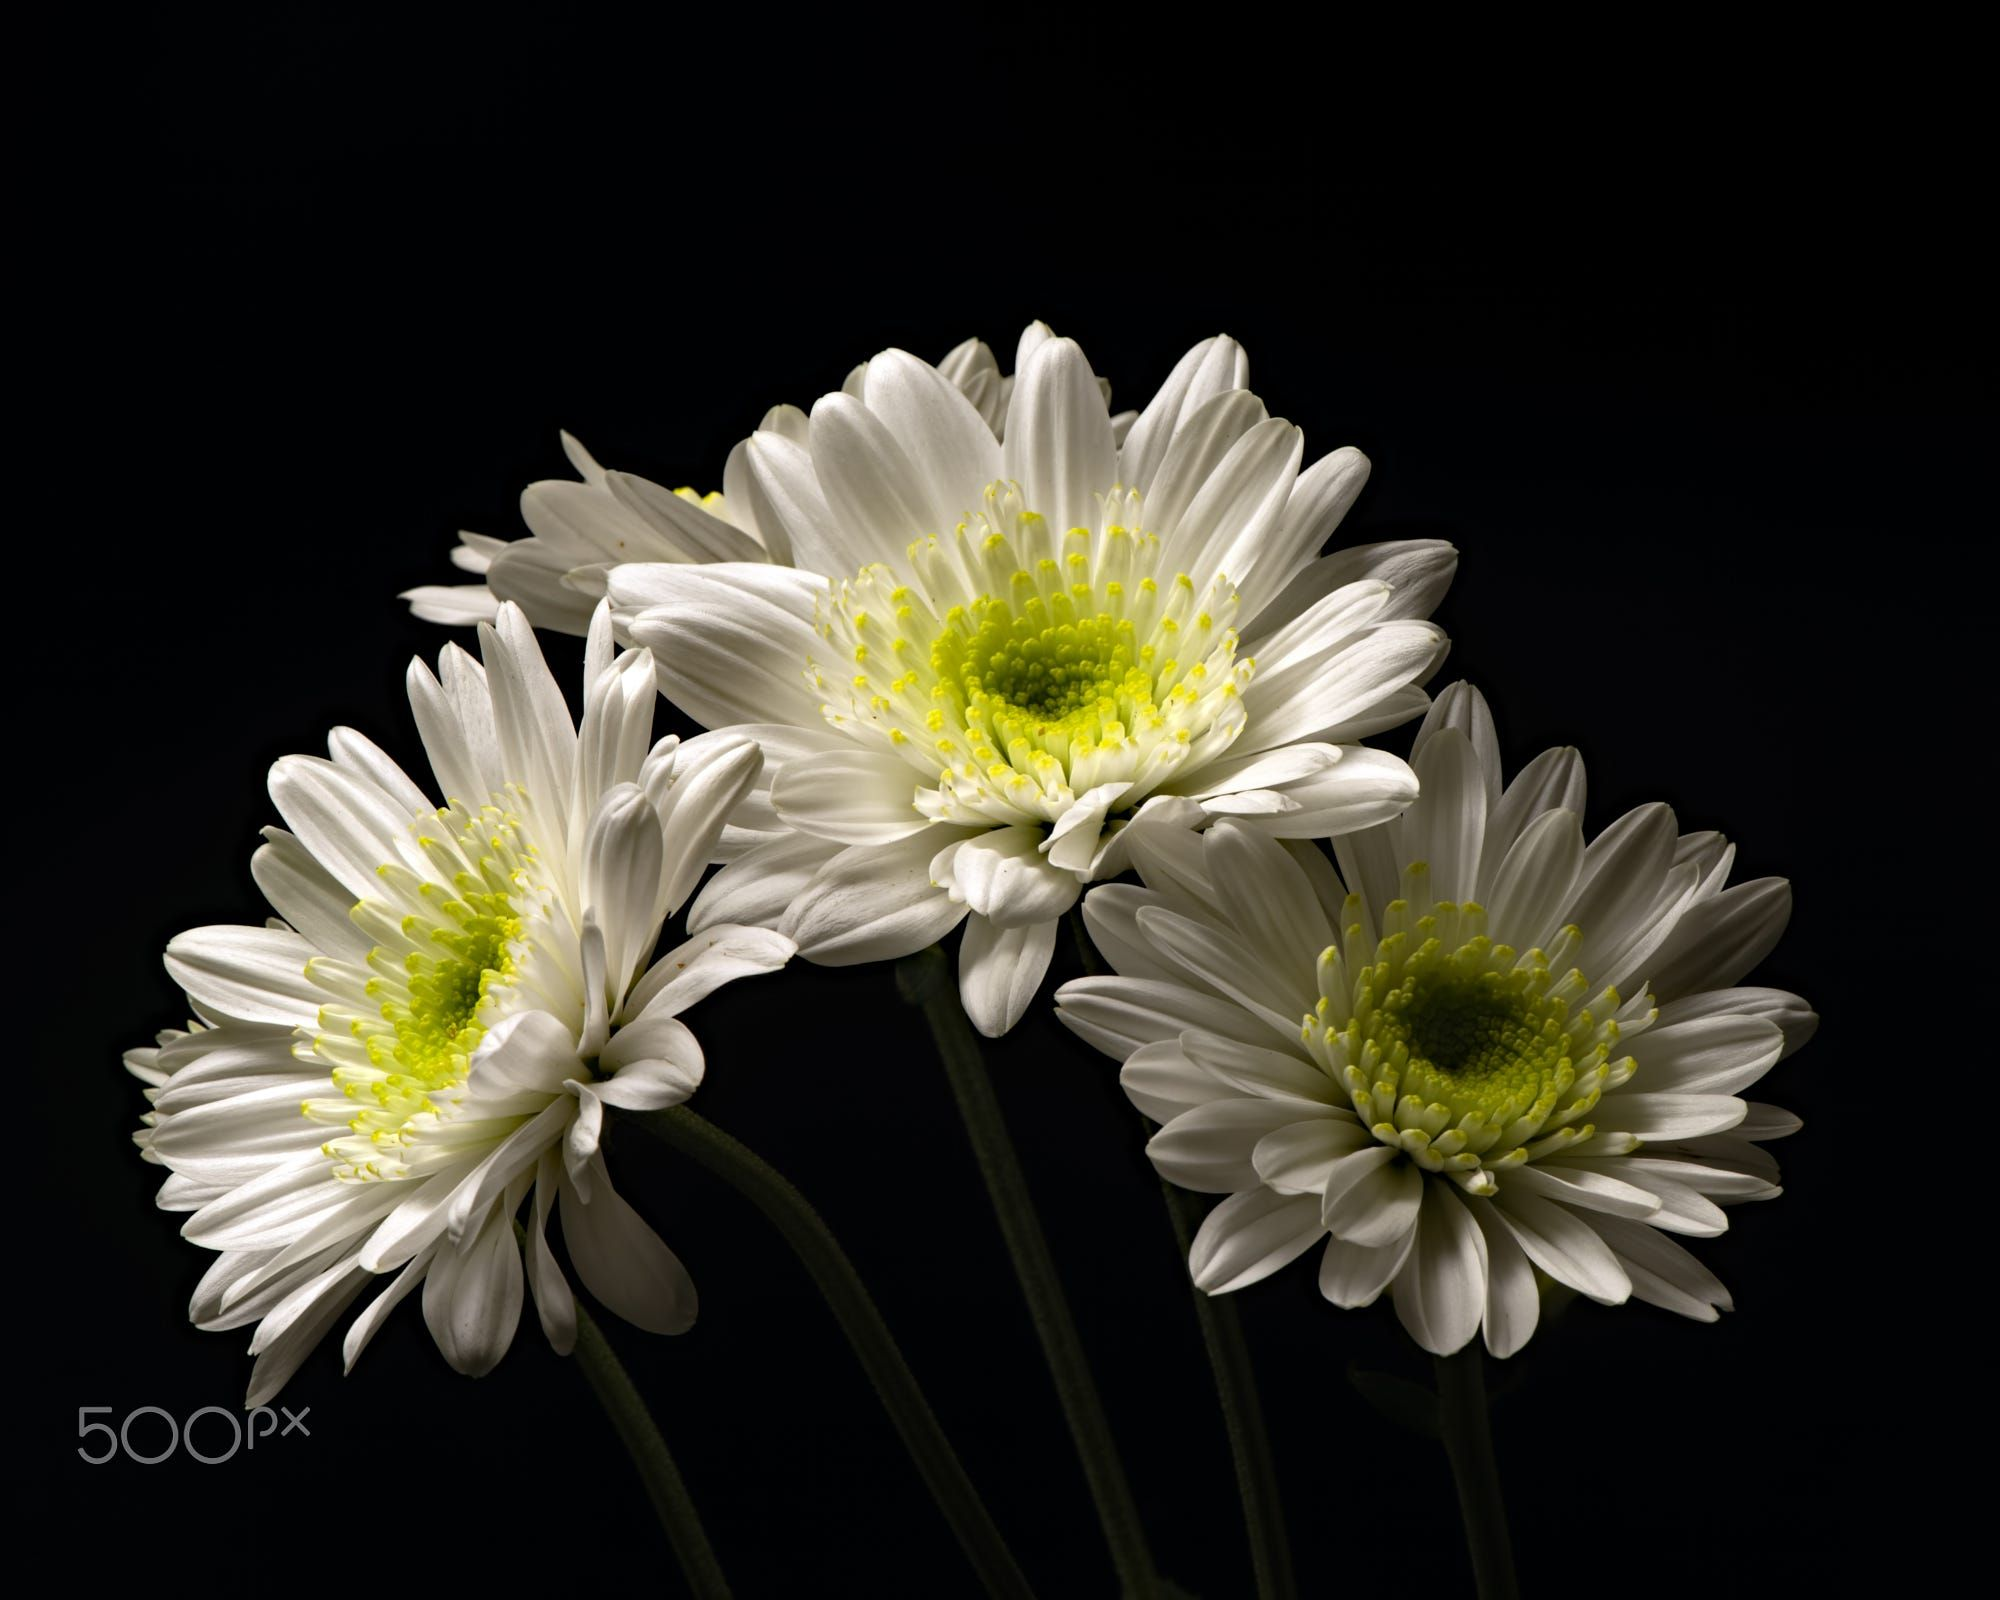 White Mum Trio 0427 By Thomas Jerger On 500px